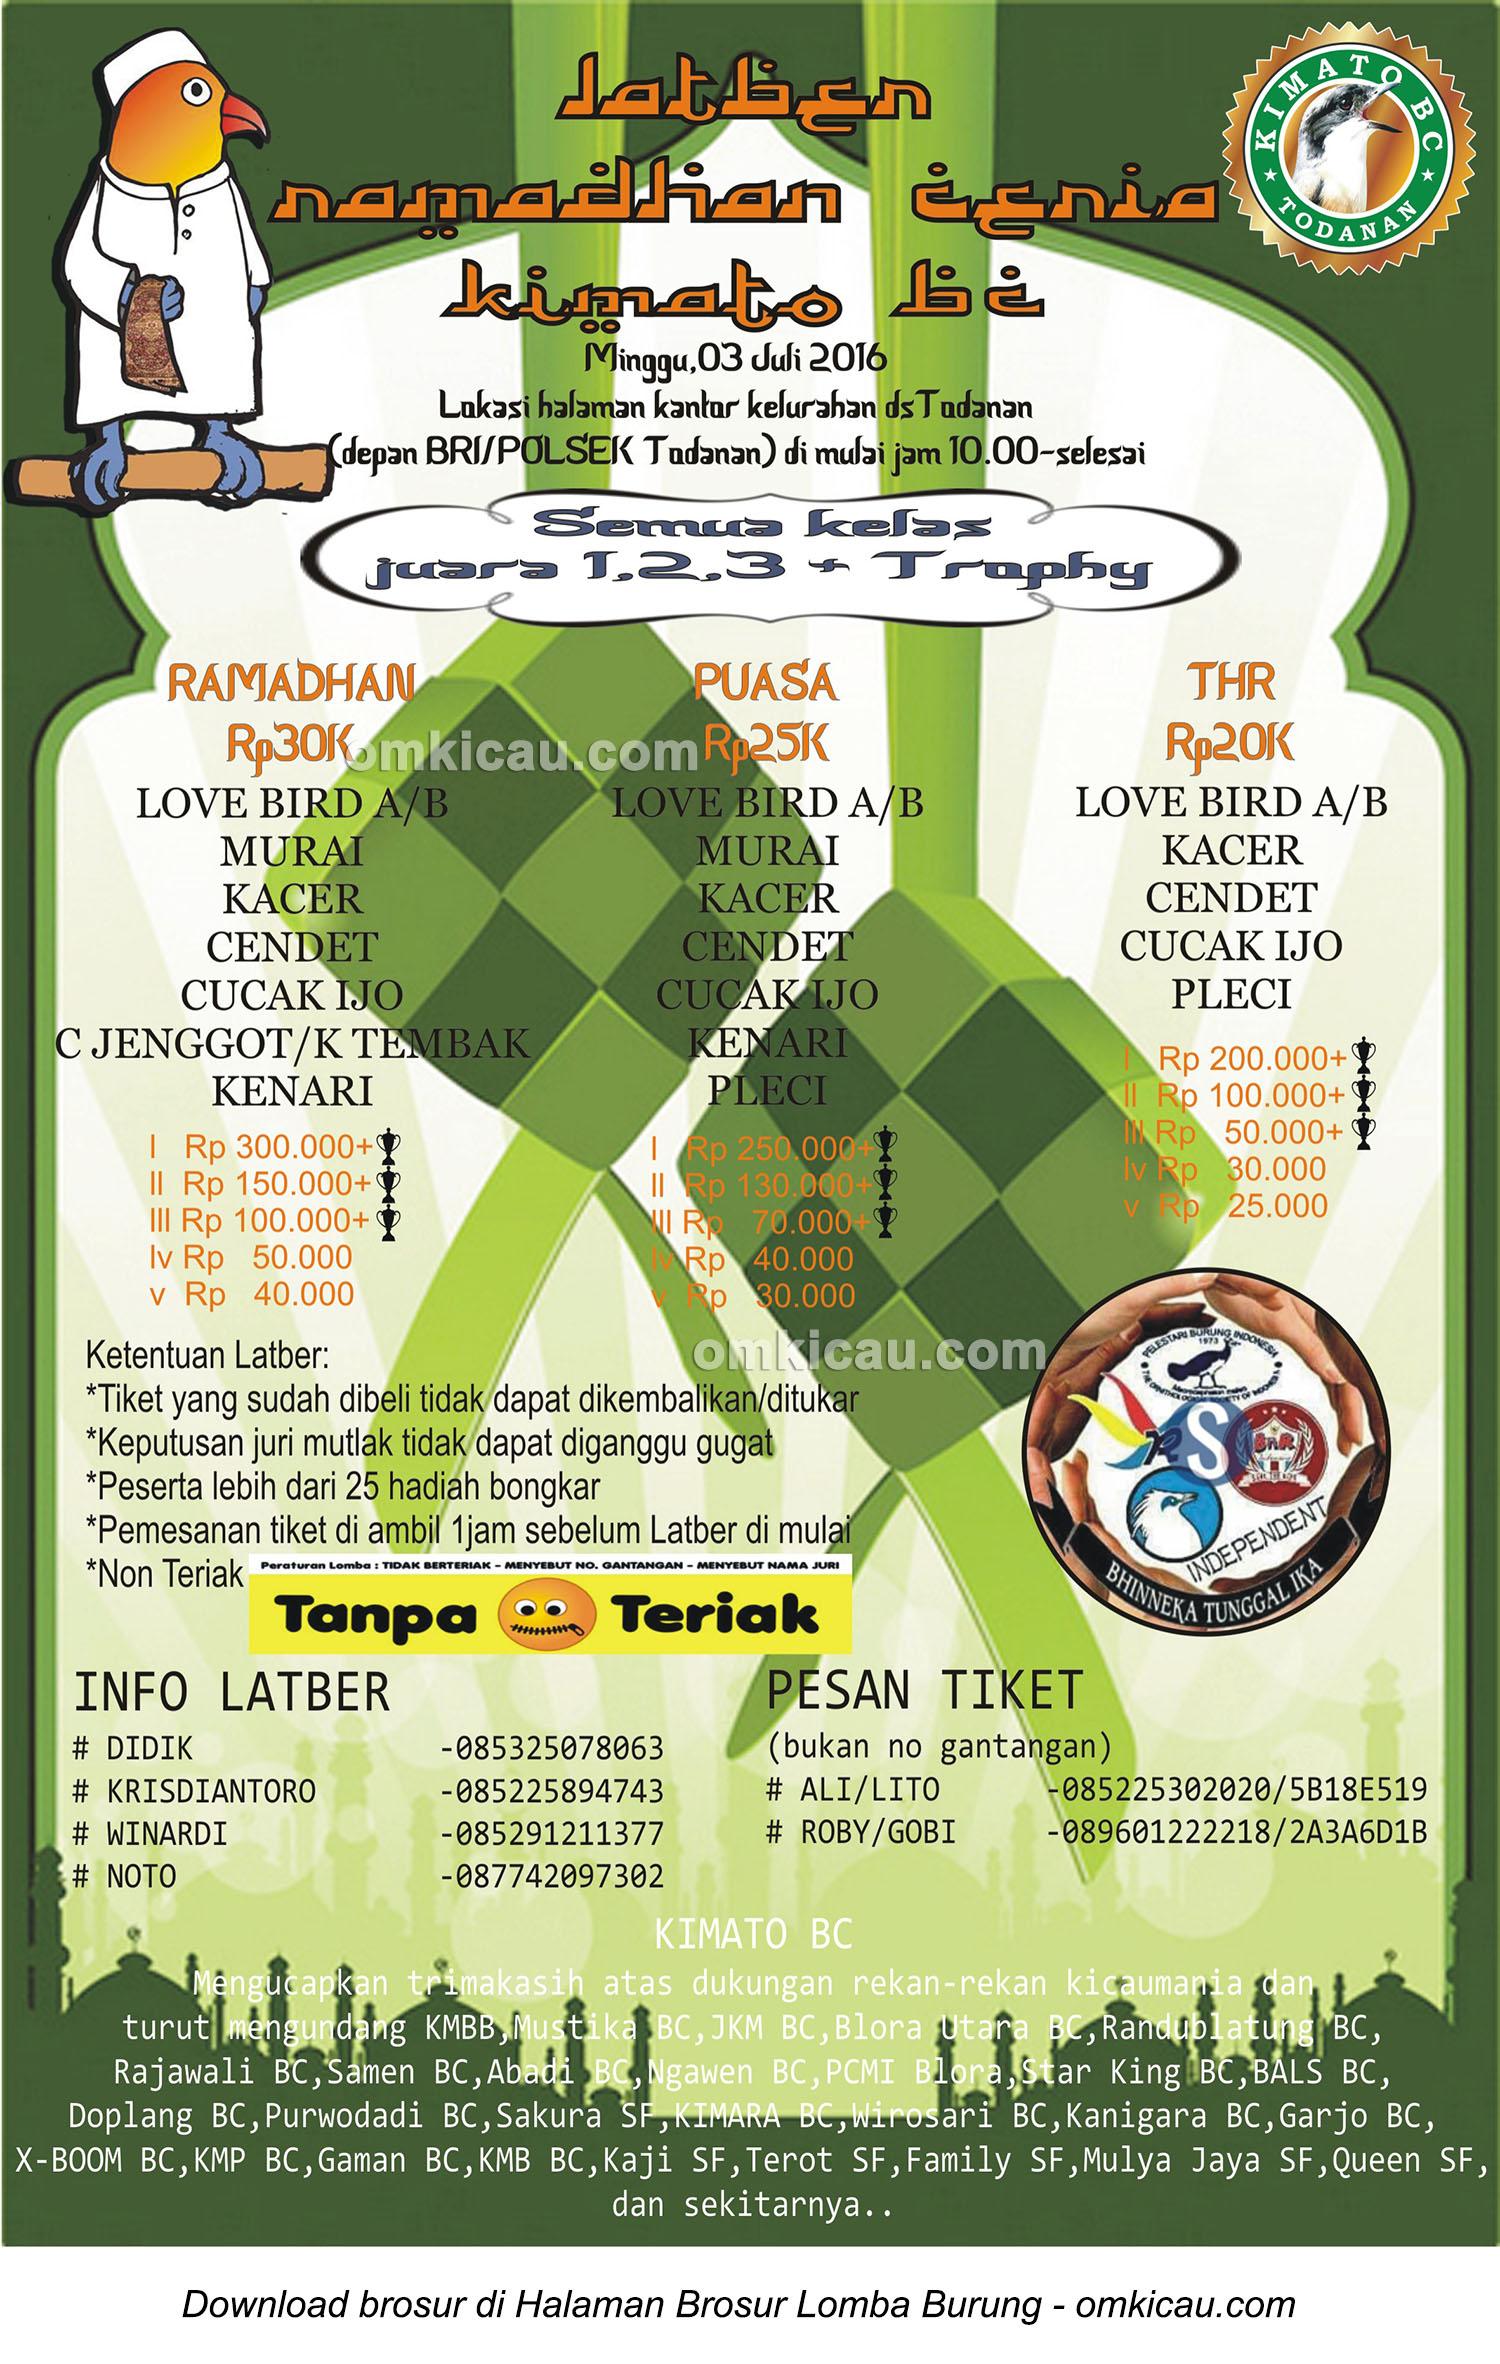 Brosur Latber Ramadhan Ceria Kimato BC, Blora, 3 Juli 2016